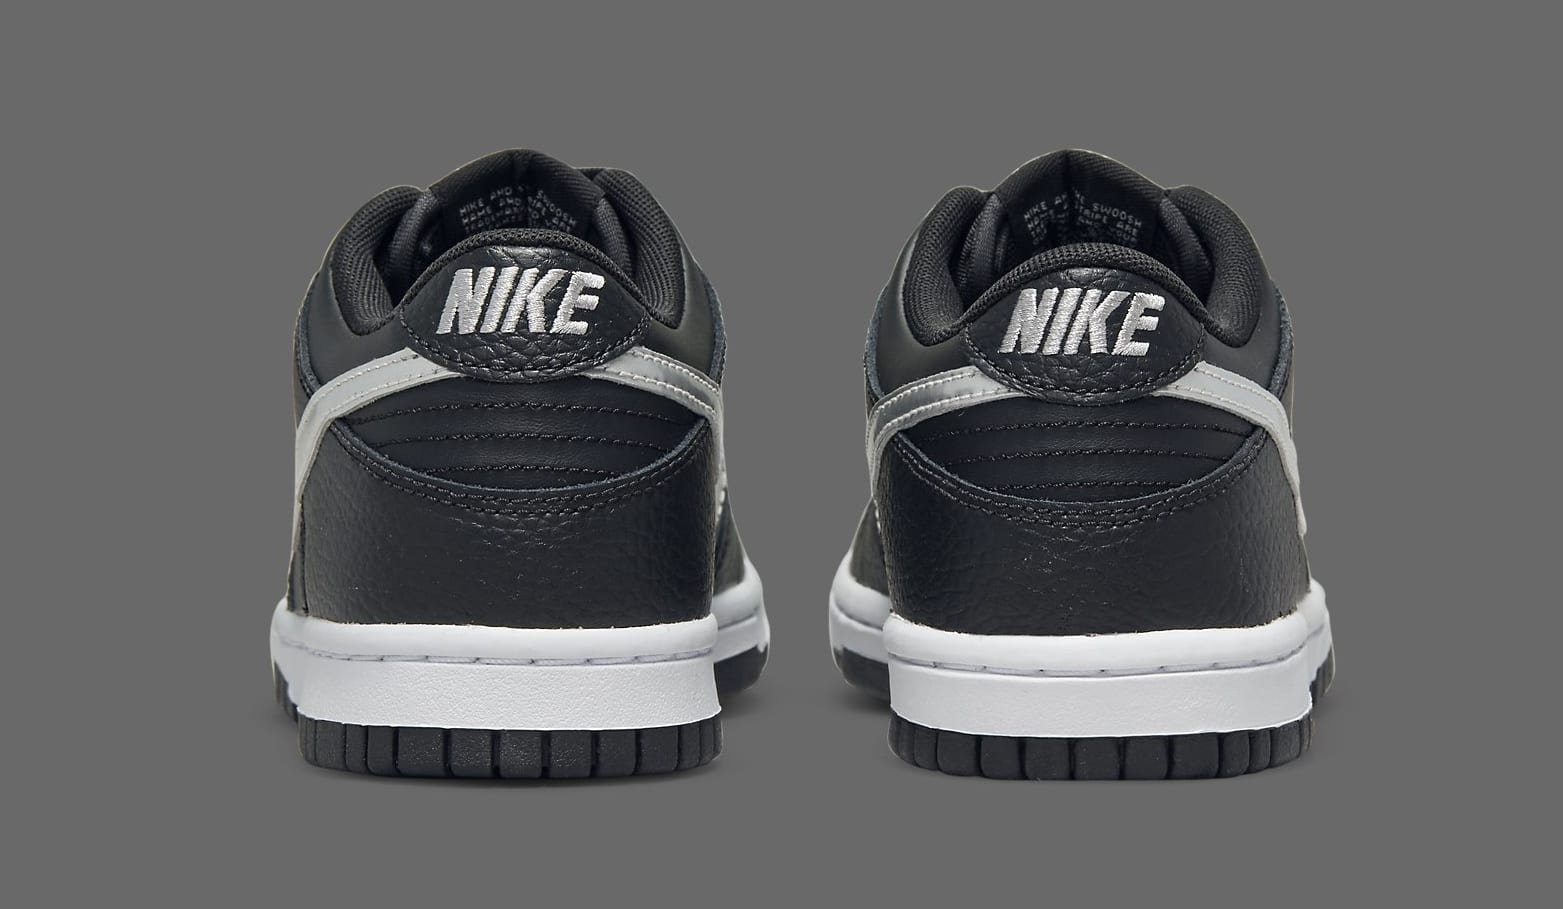 NBA x Nike Dunk Low San Antonio Spurs 75th Anniversary DC9560-001 Heel